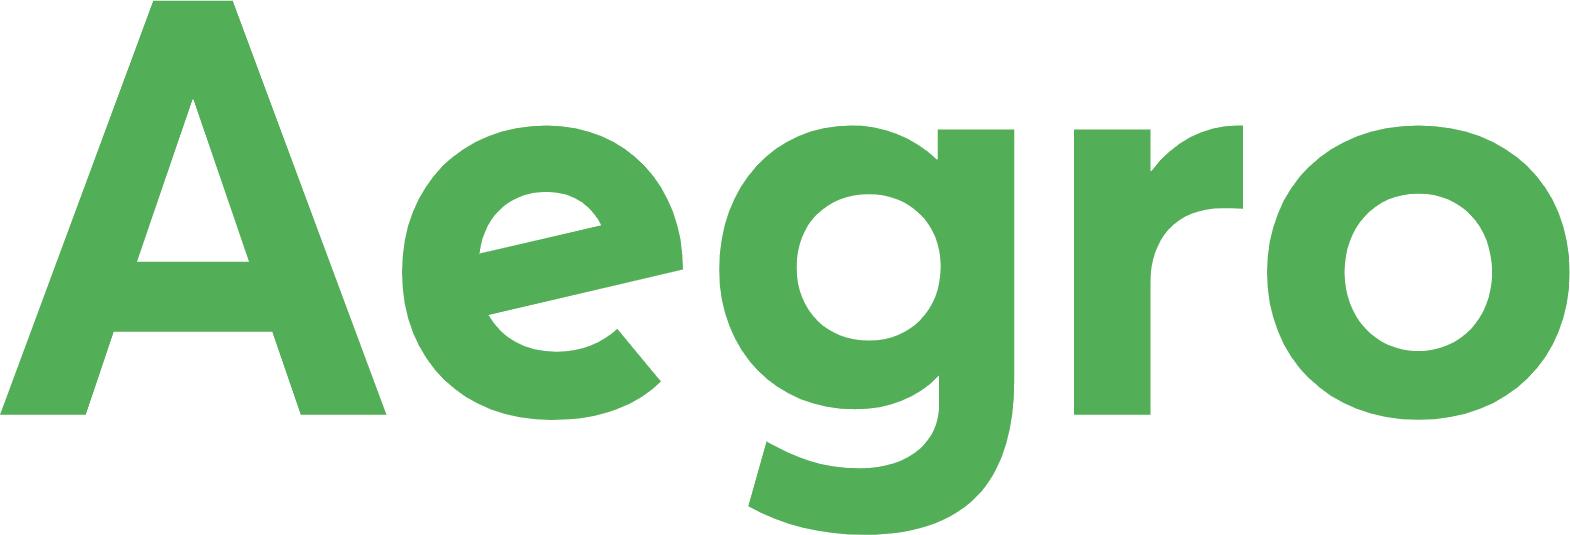 Eagro